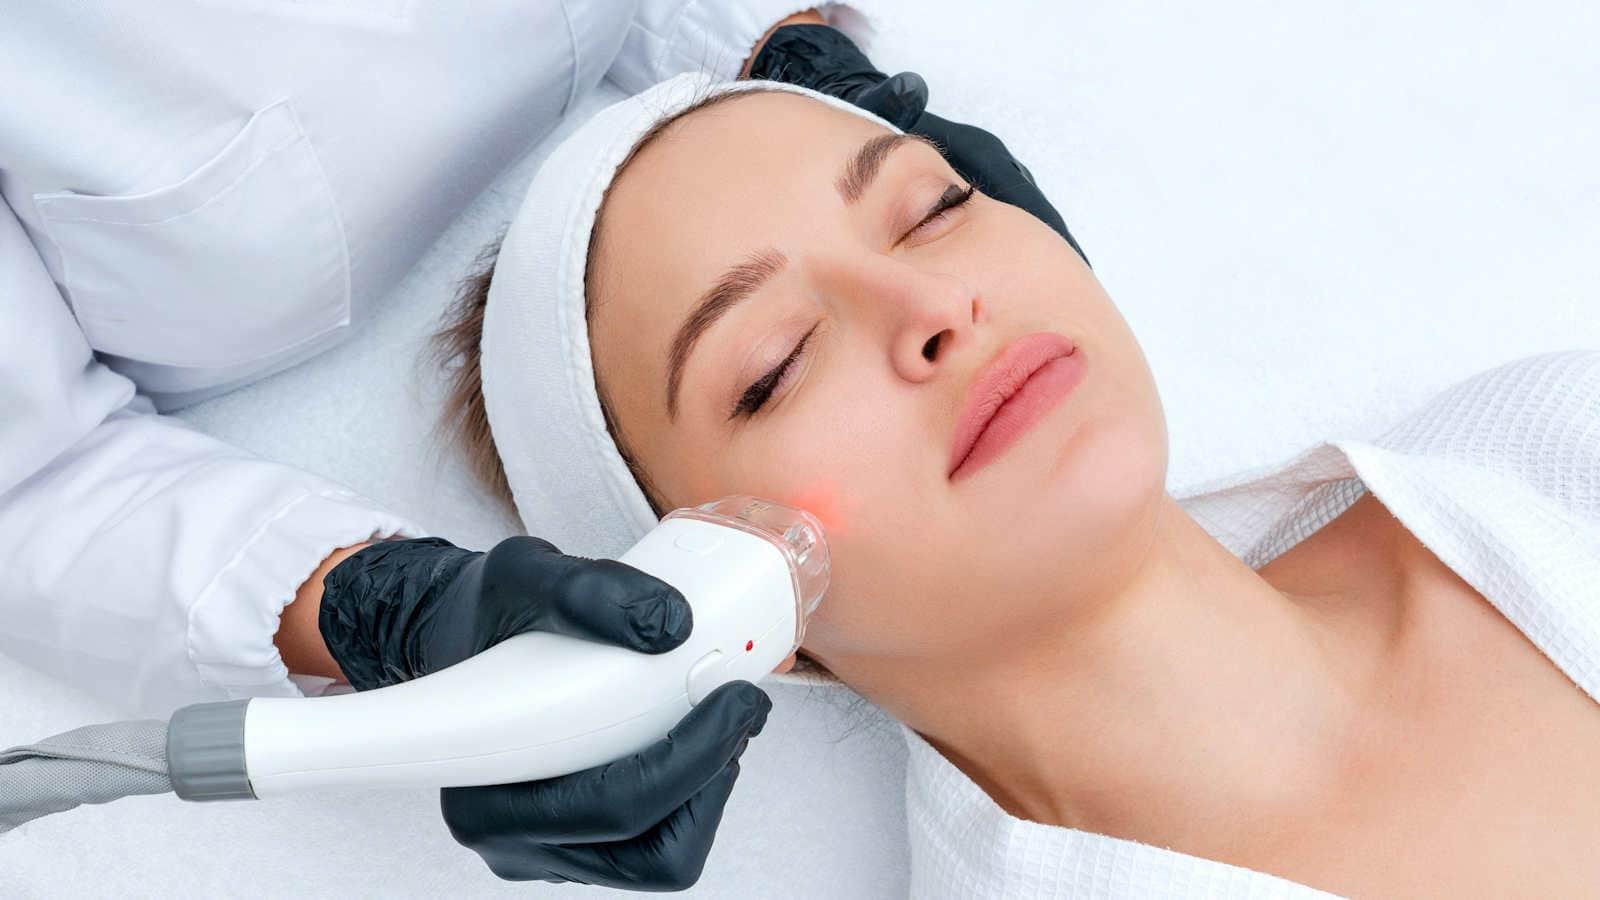 KMC Dermatology & MedSpa Shawnee